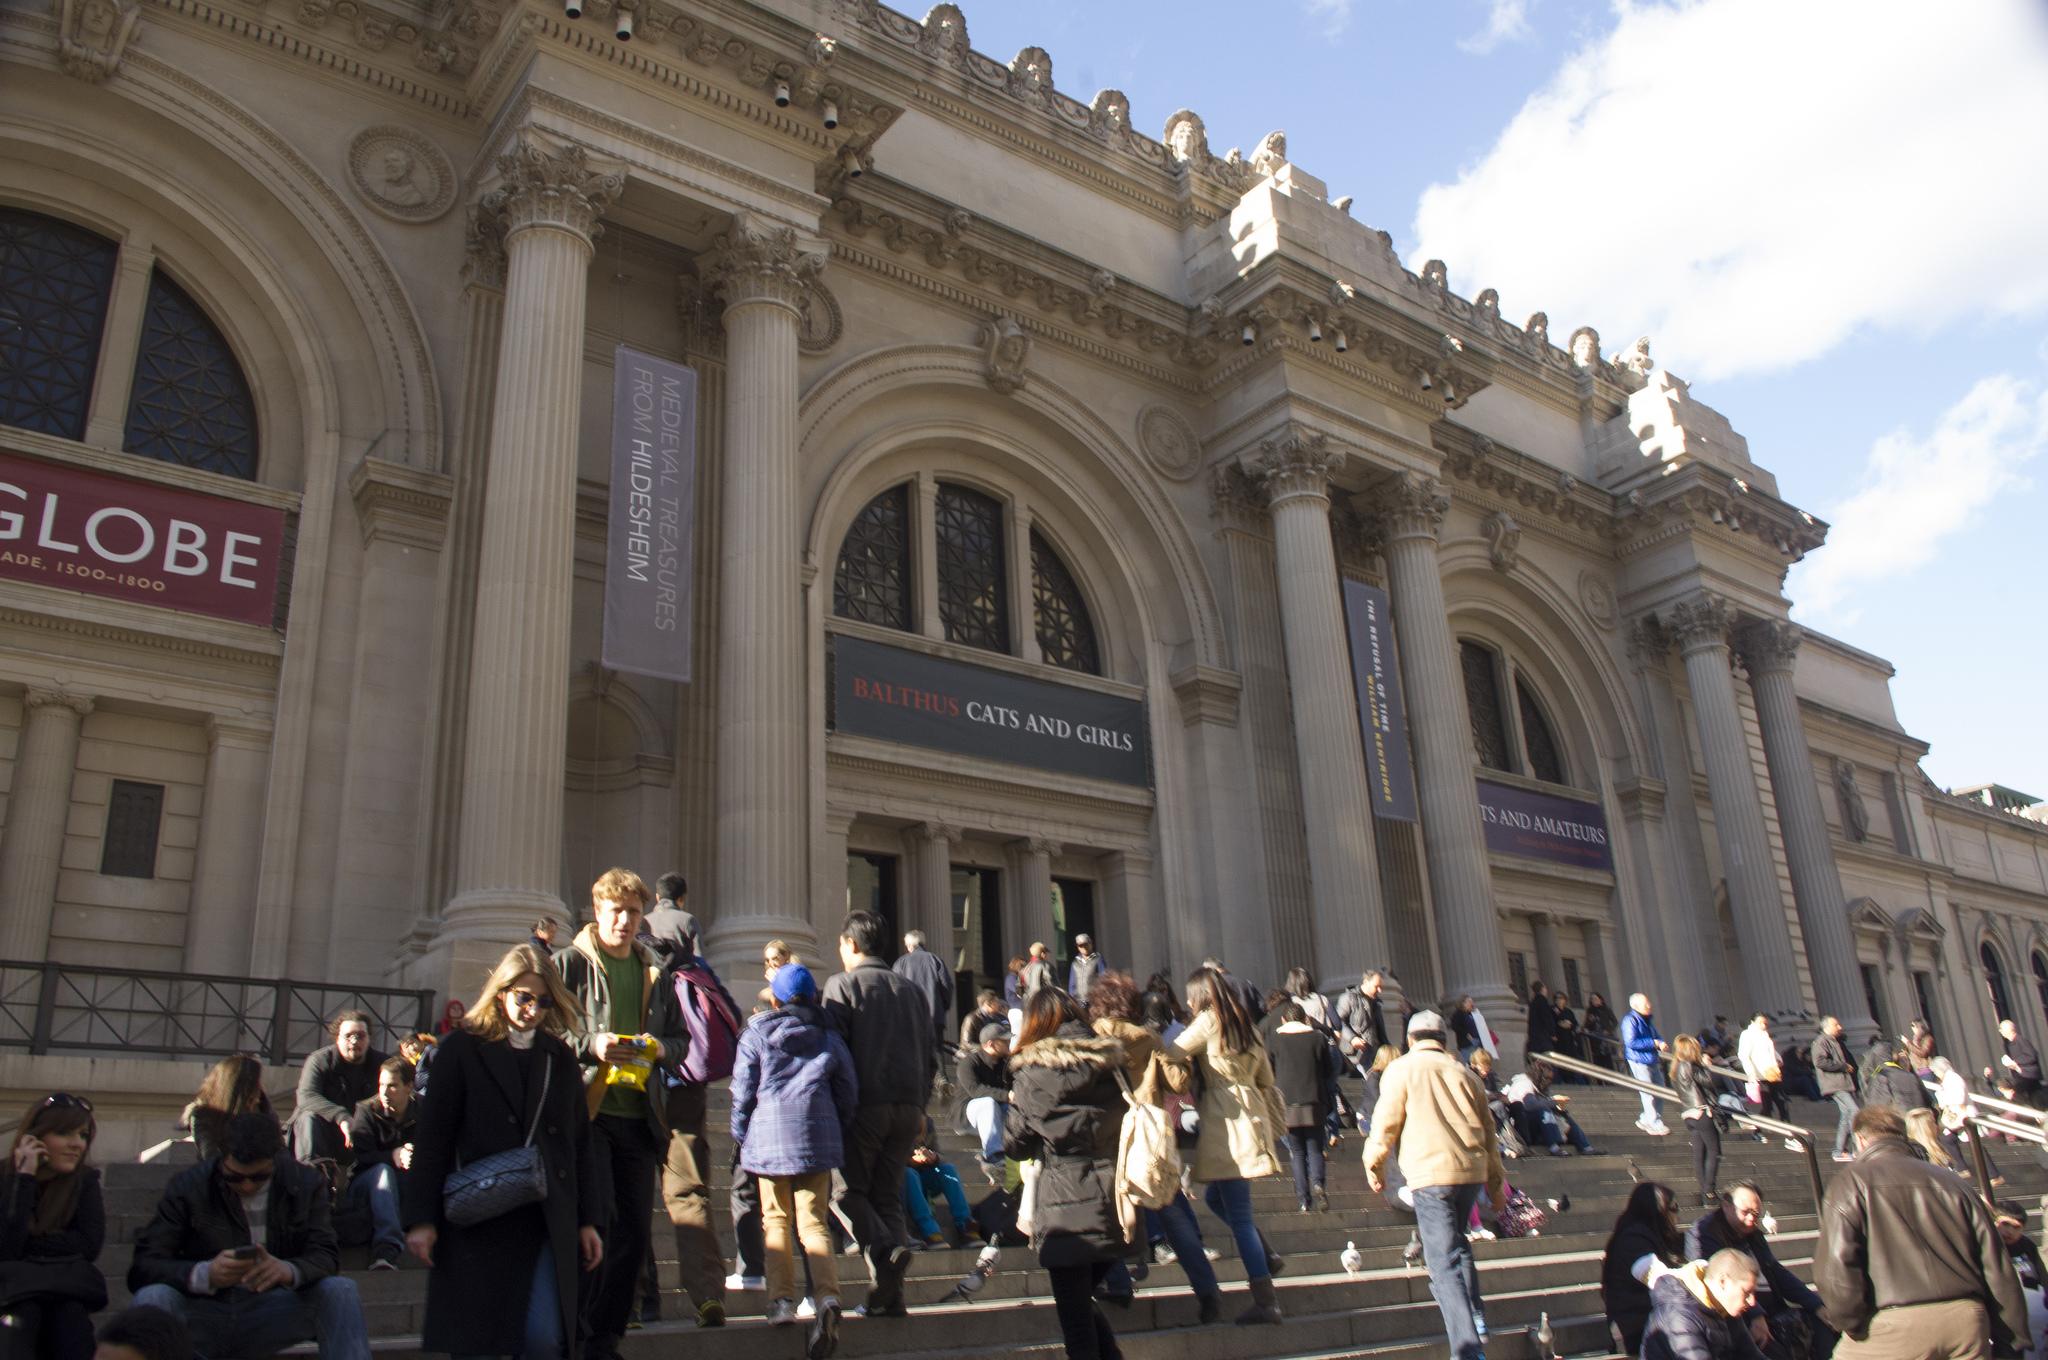 Metropolitan Museum of Art in New York. Photo by alphacityguides.